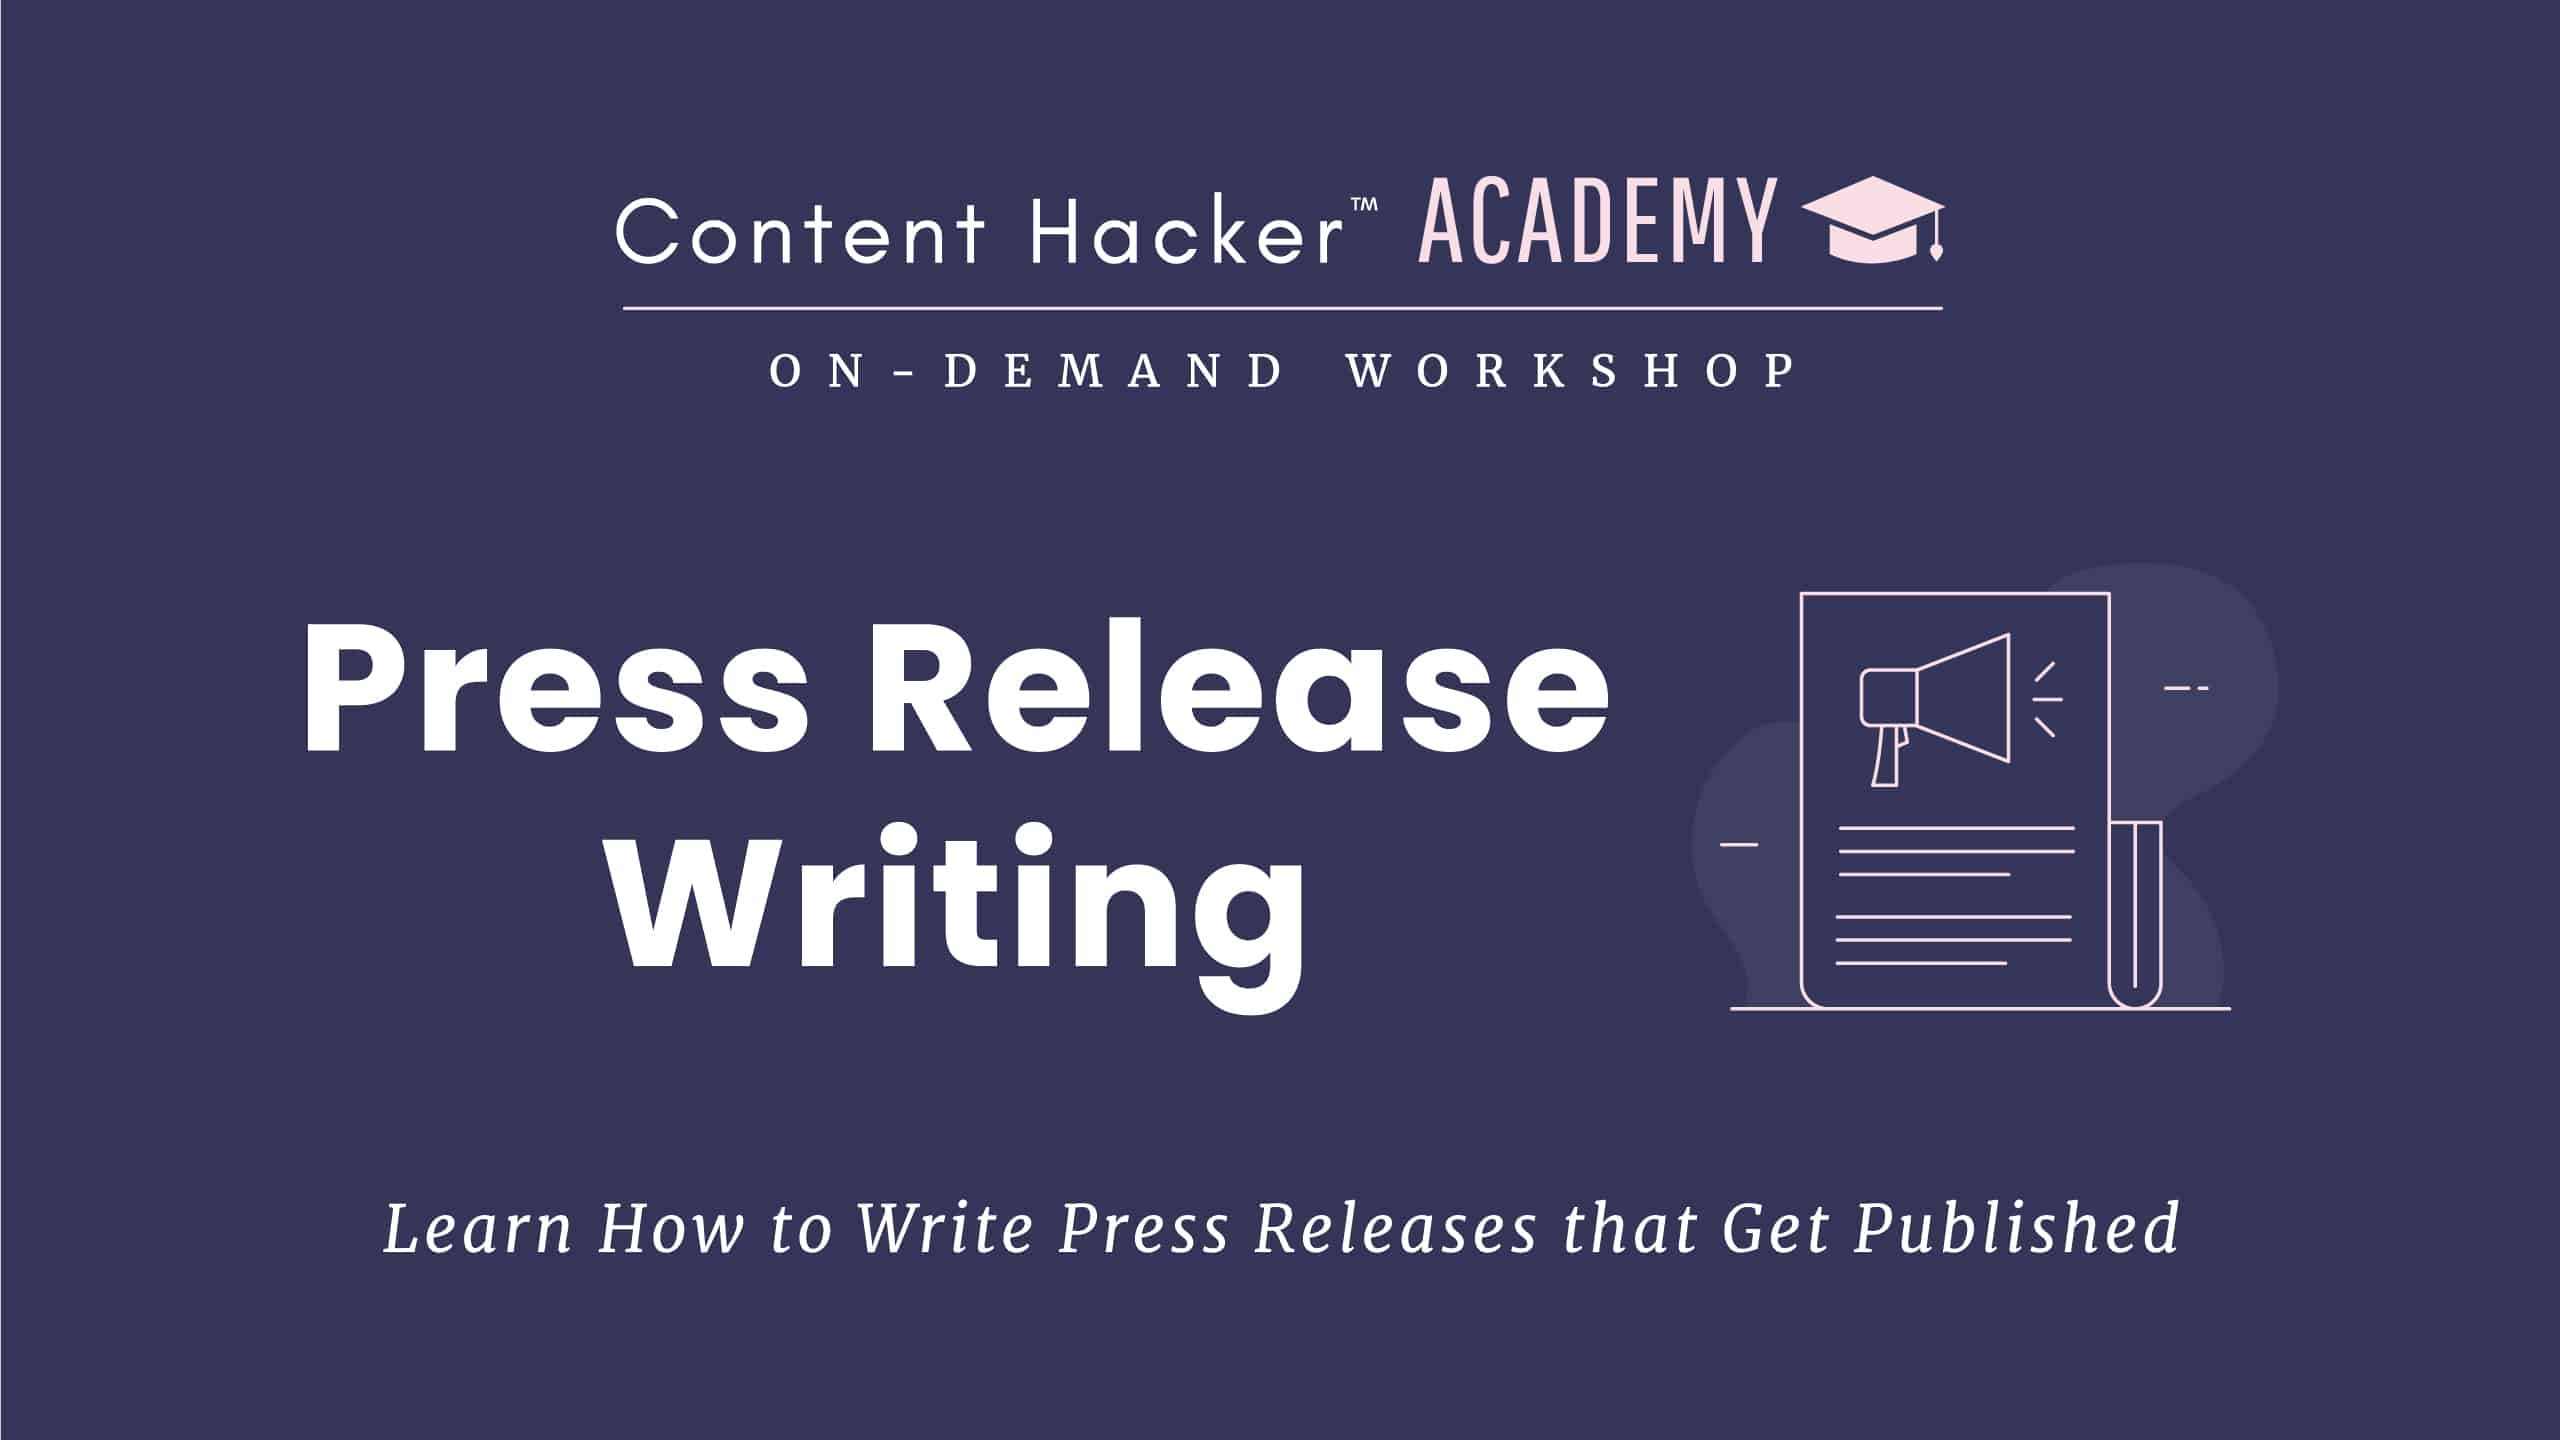 content hacker workshops - press release writing